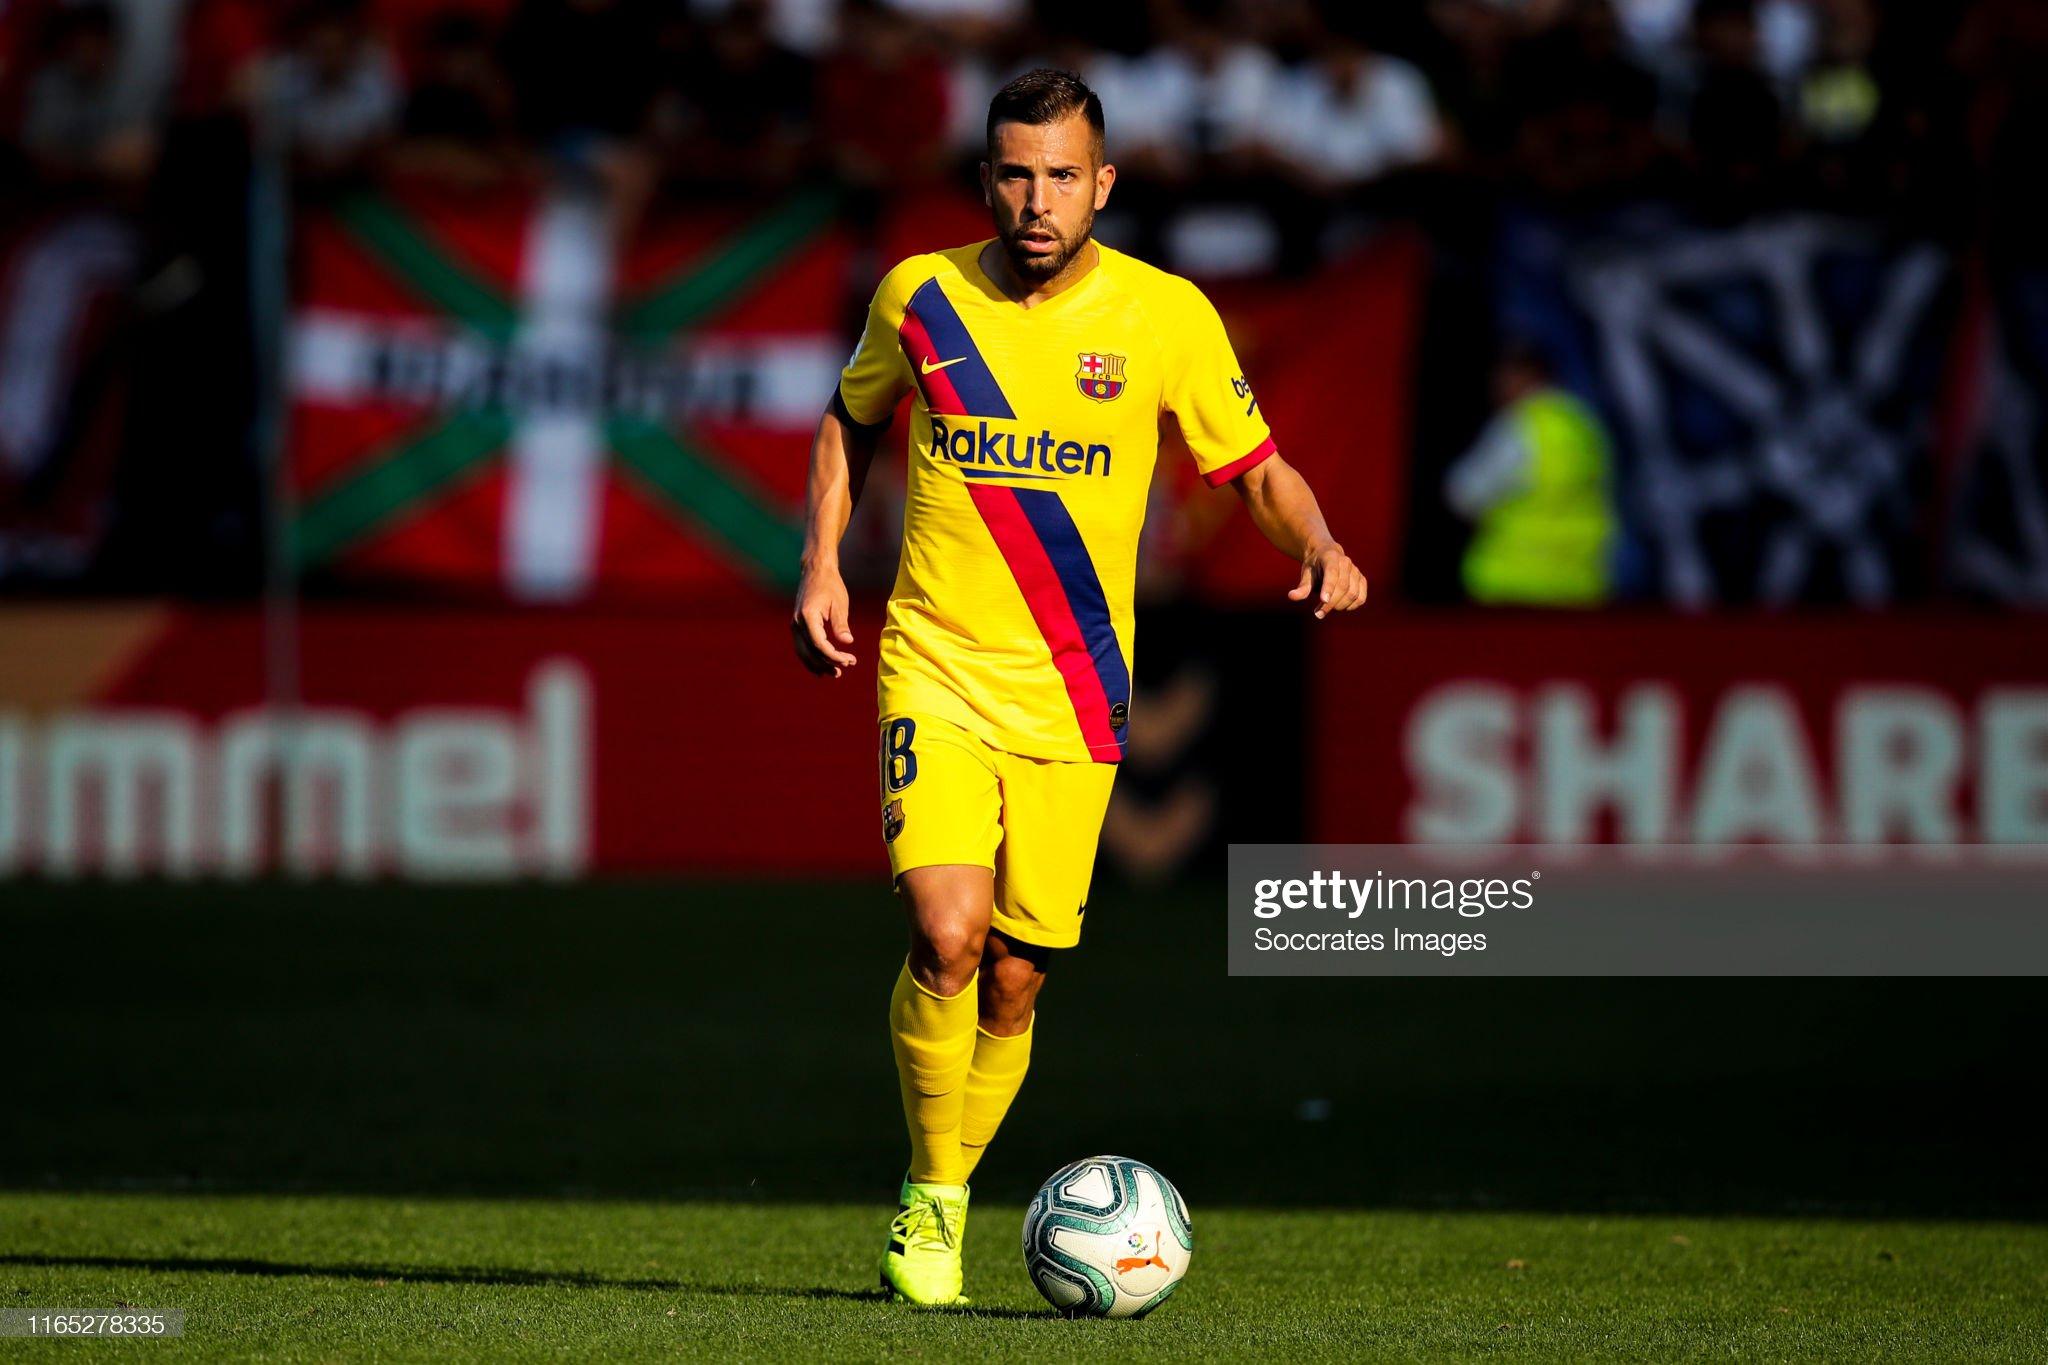 صور مباراة : أوساسونا - برشلونة 2-2 ( 31-08-2019 )  Jordi-alba-of-fc-barcelona-during-the-la-liga-santander-match-between-picture-id1165278335?s=2048x2048